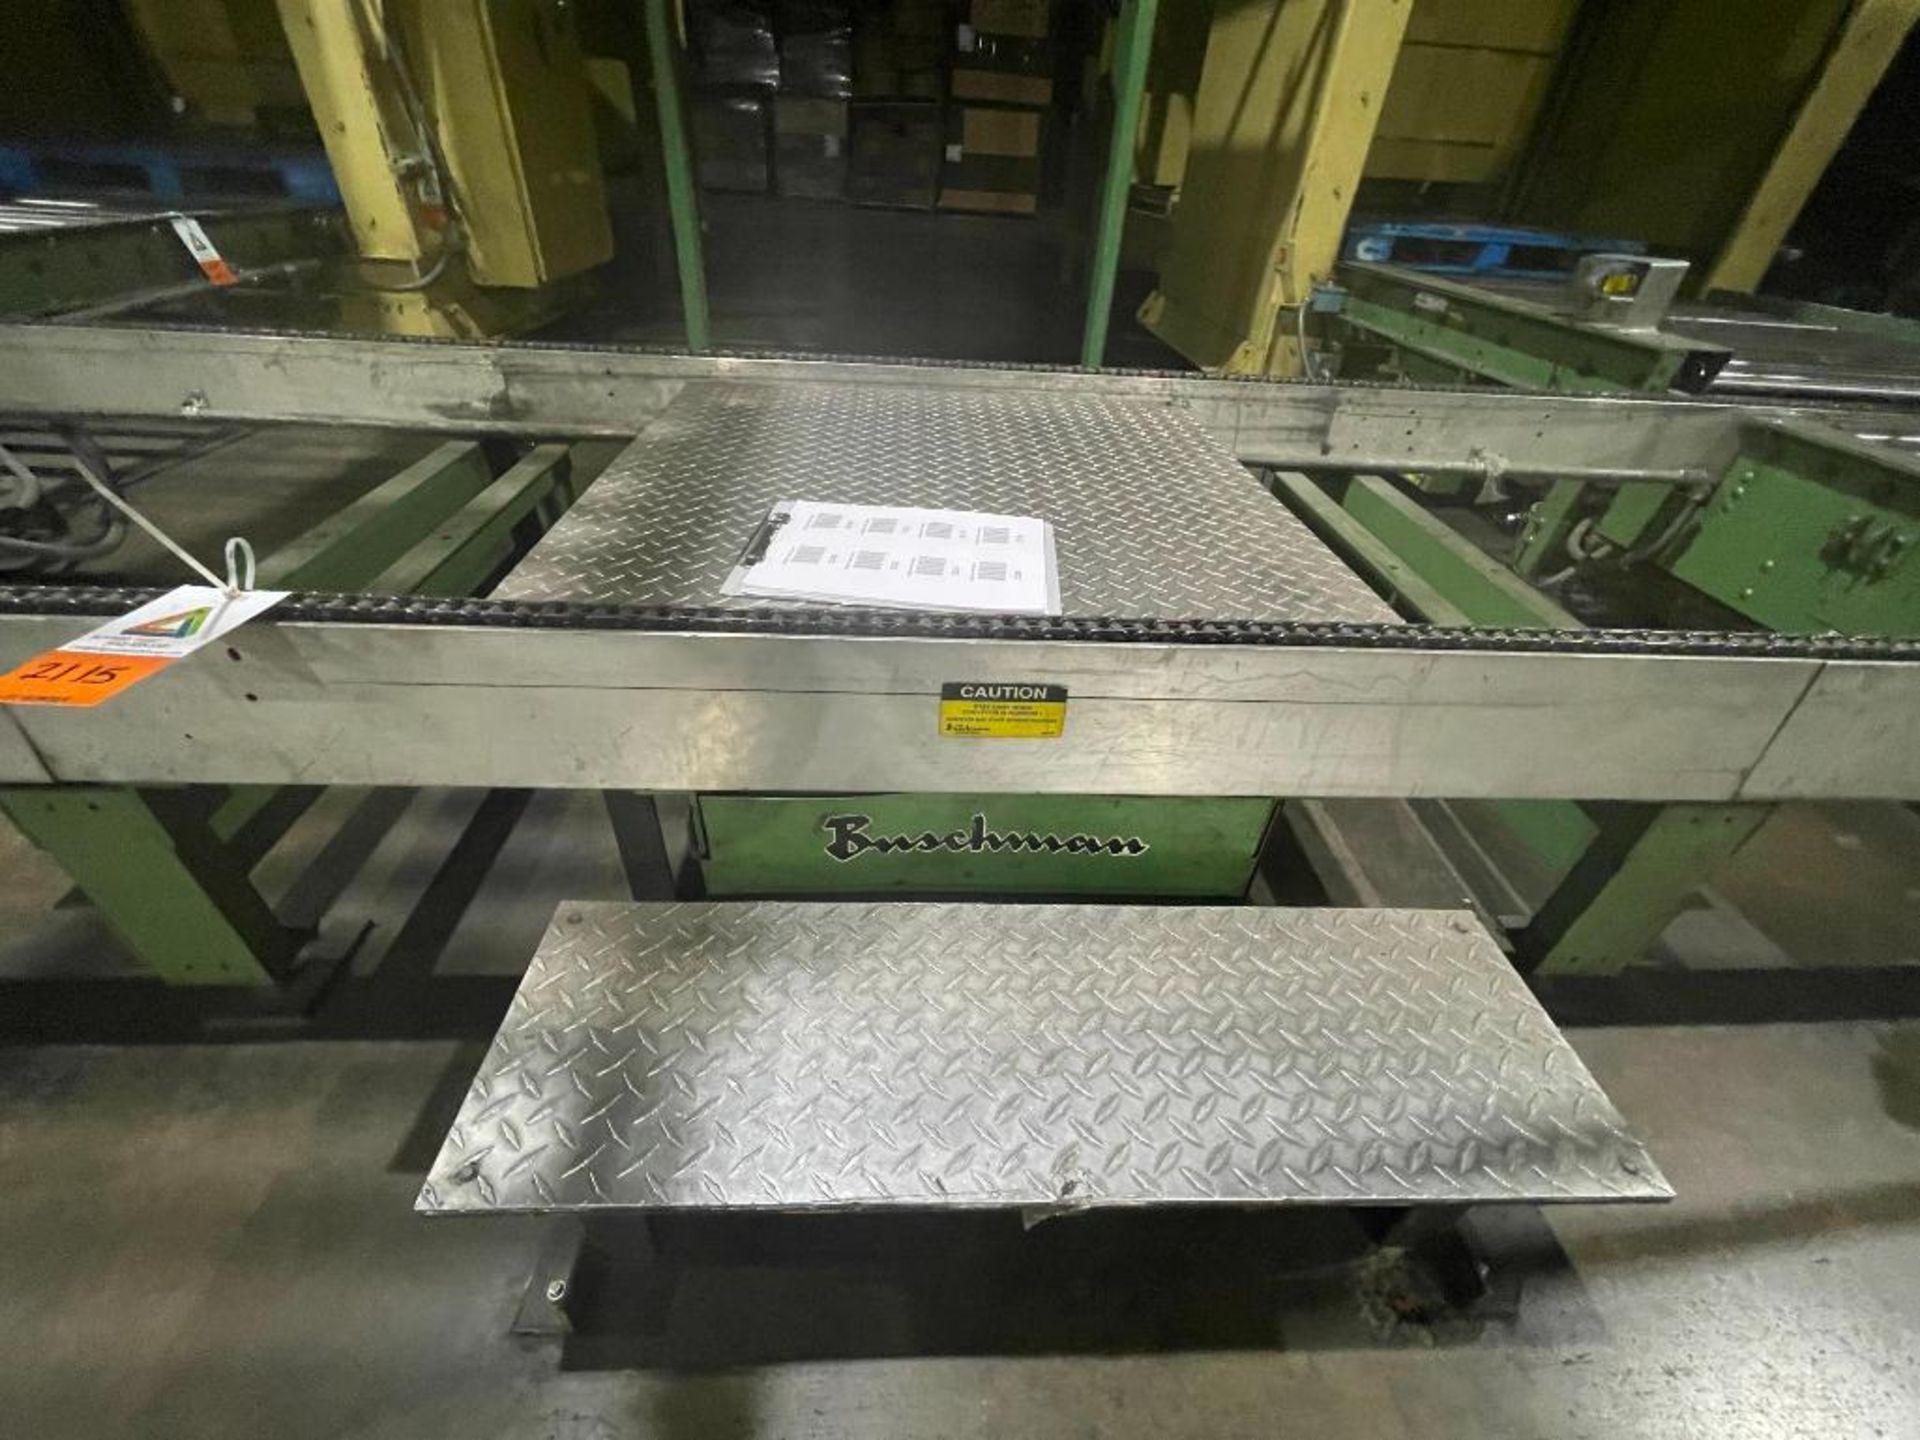 Buschman full pallet conveyor - Image 10 of 10